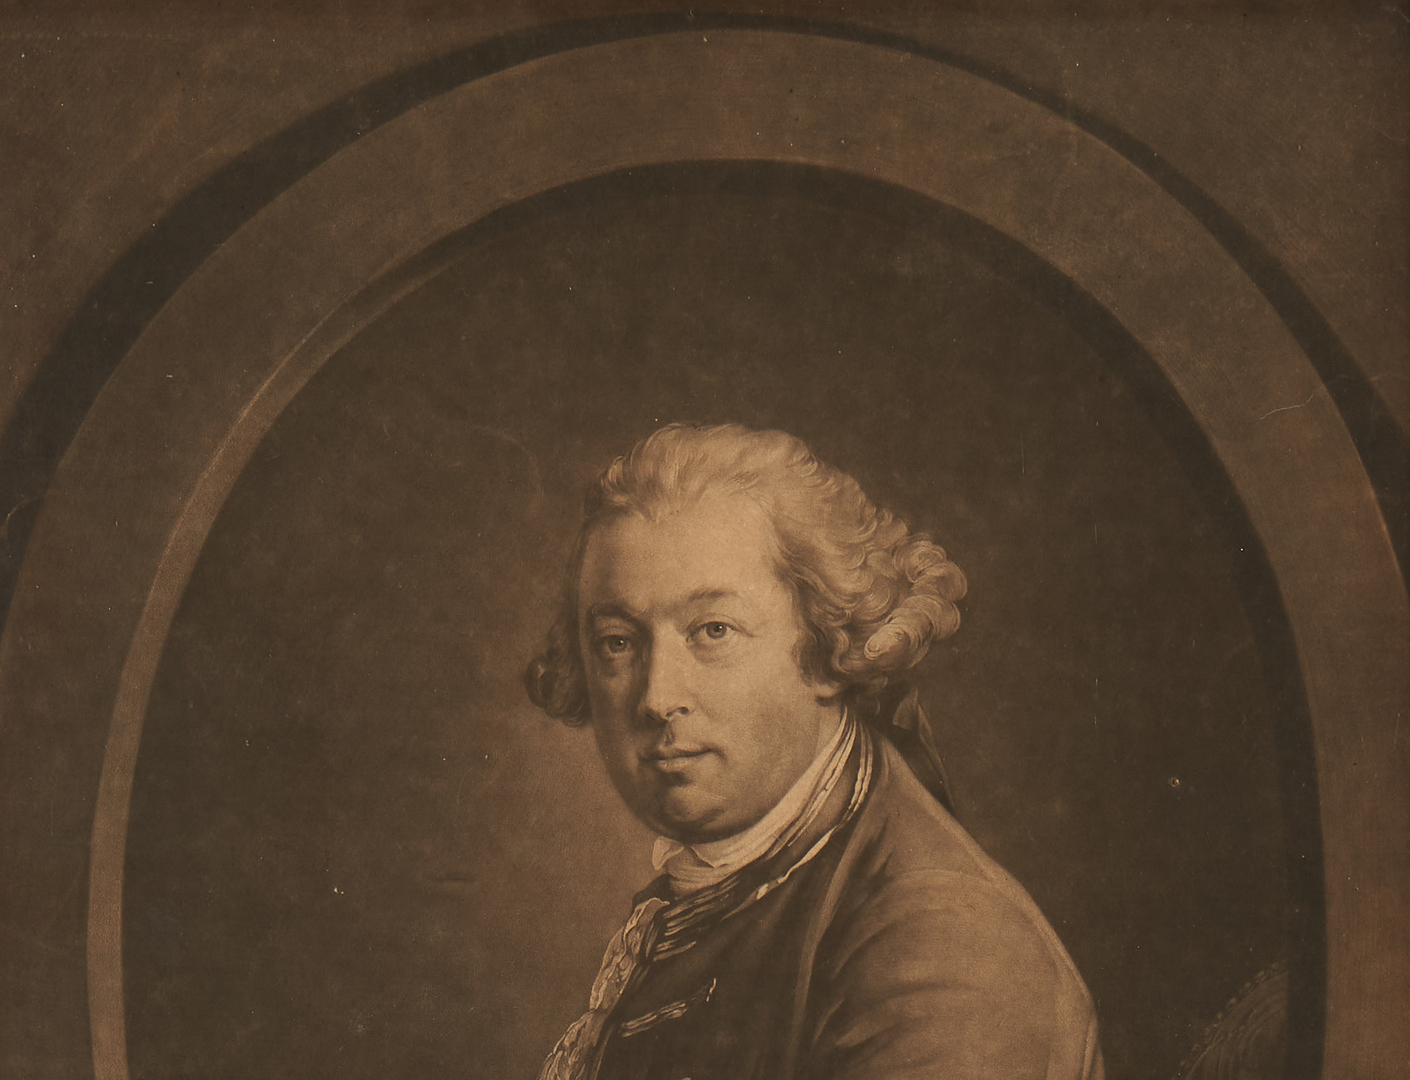 Lot 124: Mezzotint portrait of Gov. Thos. Pownall, SC and Mass.